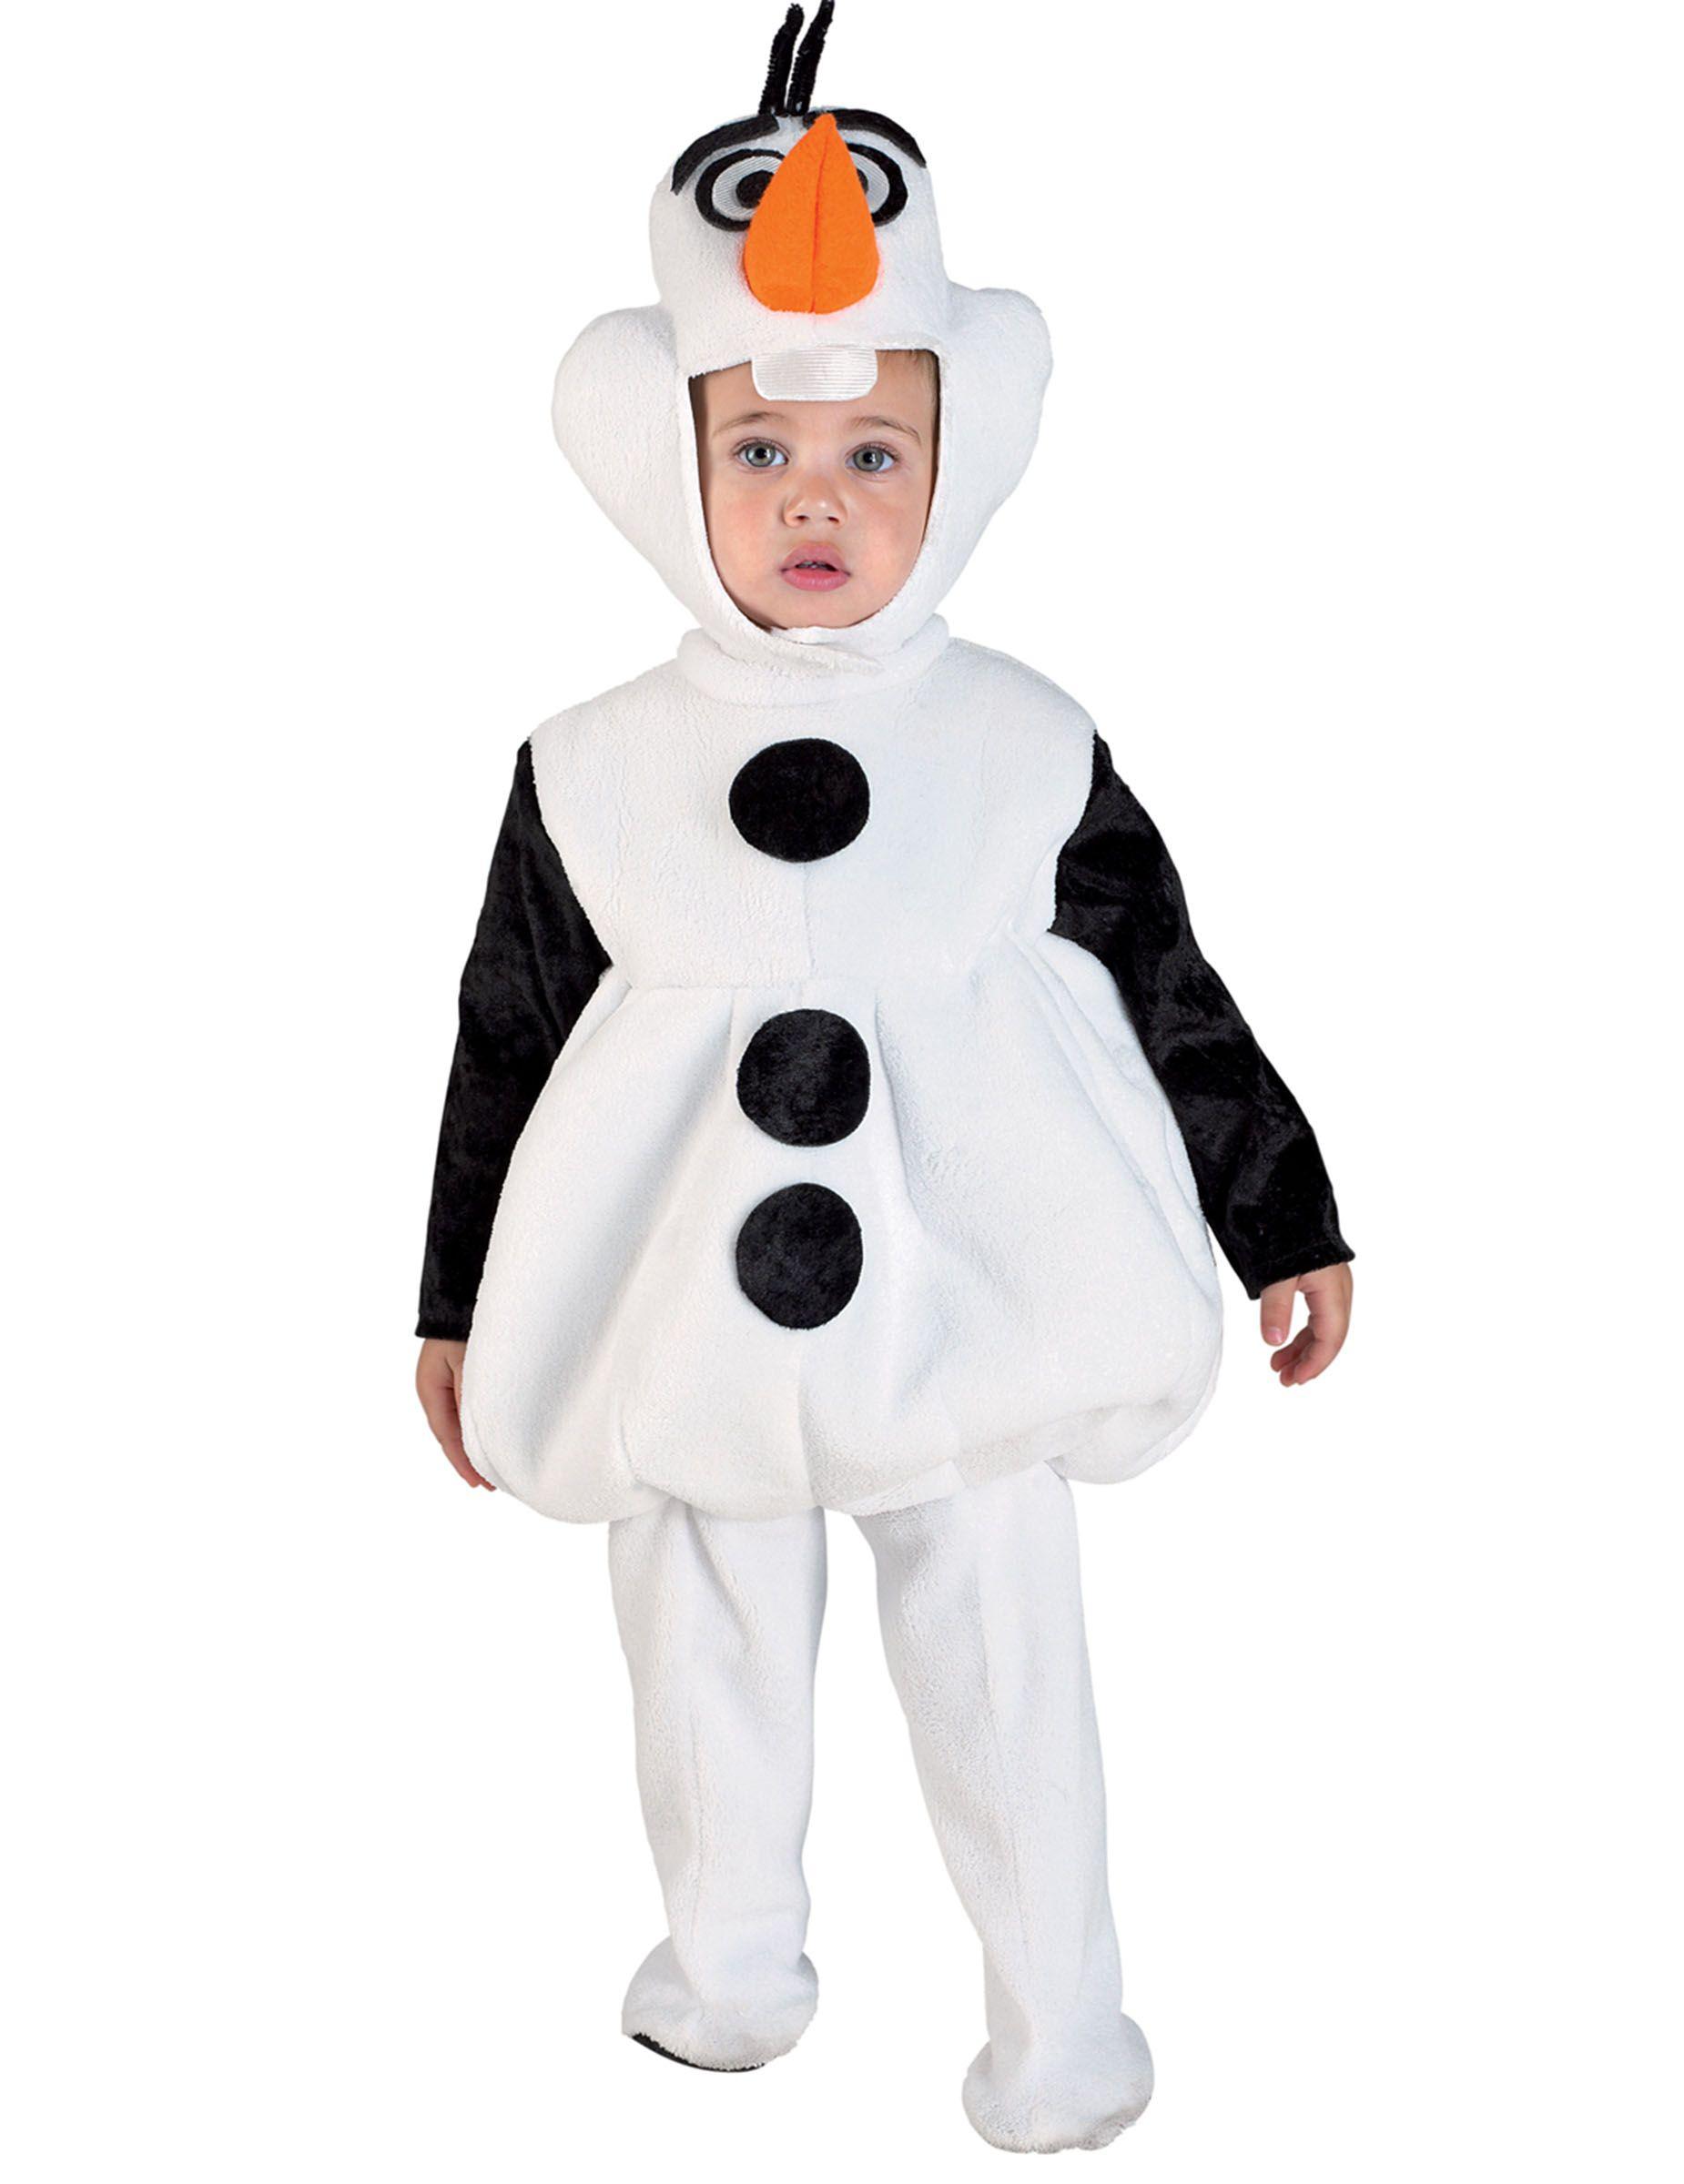 Disfarce boneco de neve criança  0f5cec604b66